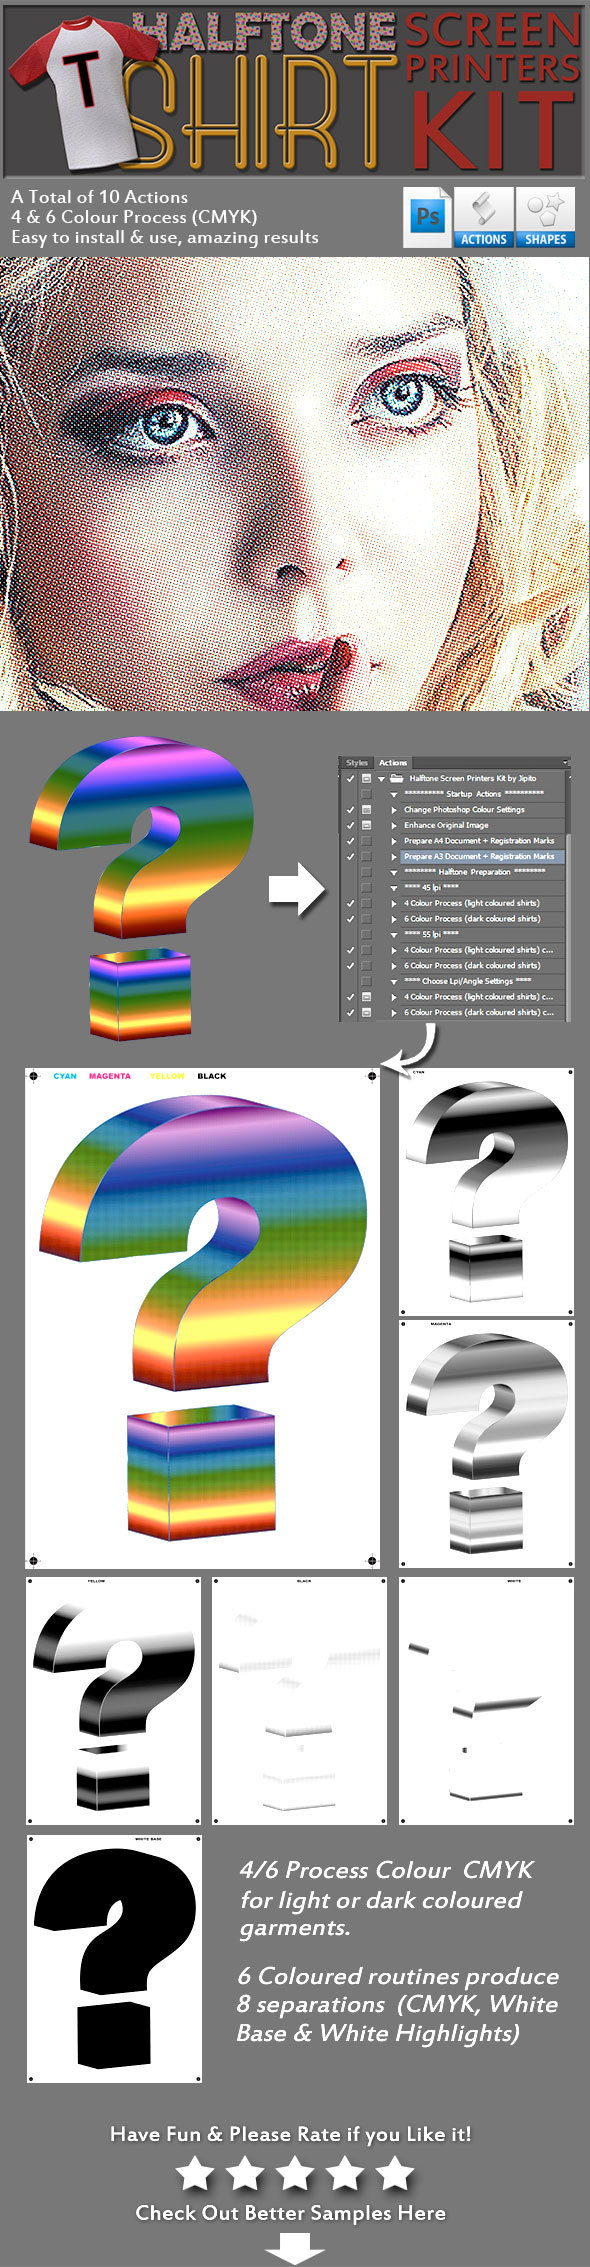 Halftone Screen Printers Kit - Utilities Actions